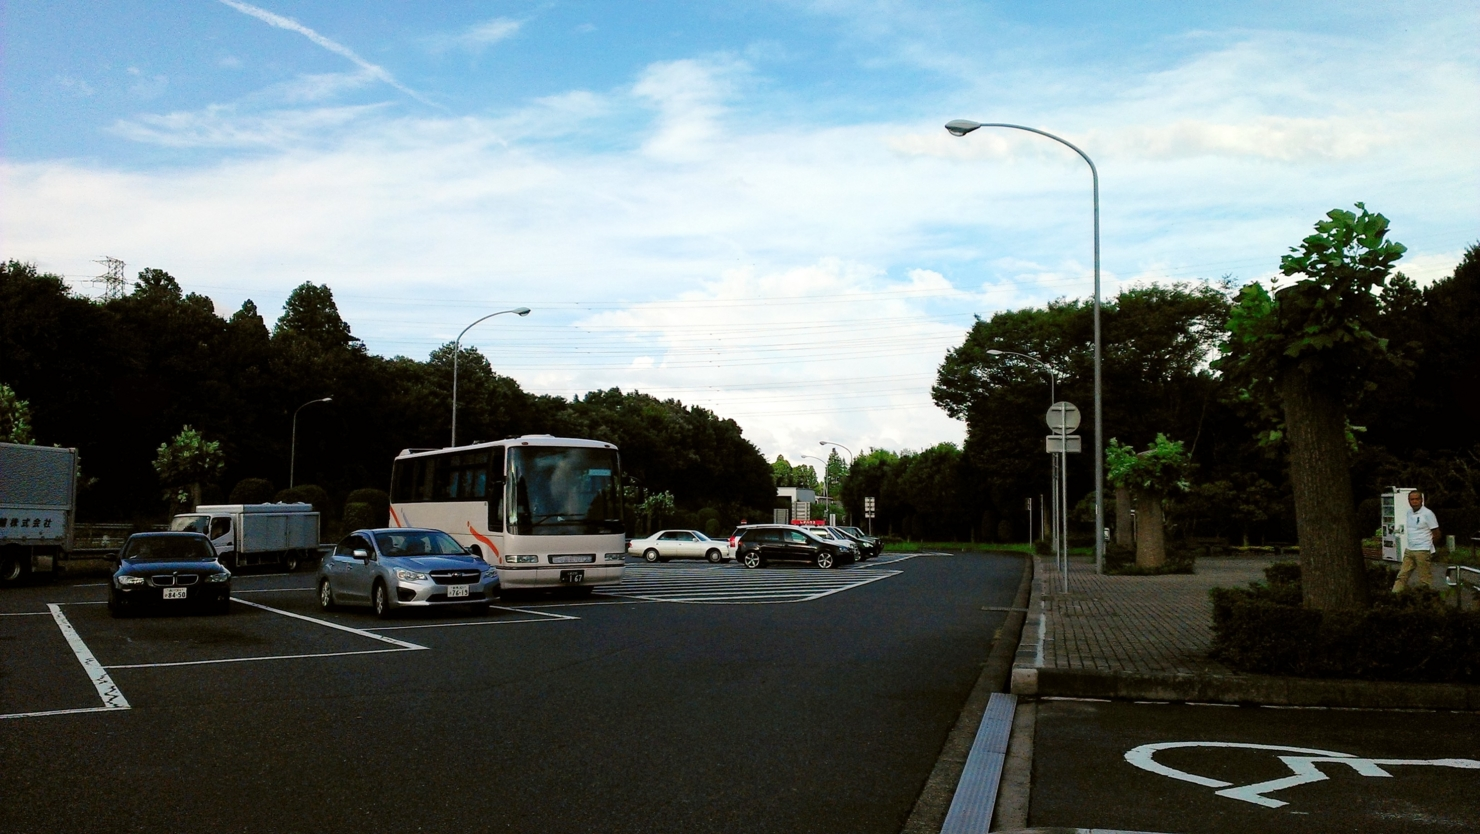 f:id:ToshUeno:20130915154952j:plain